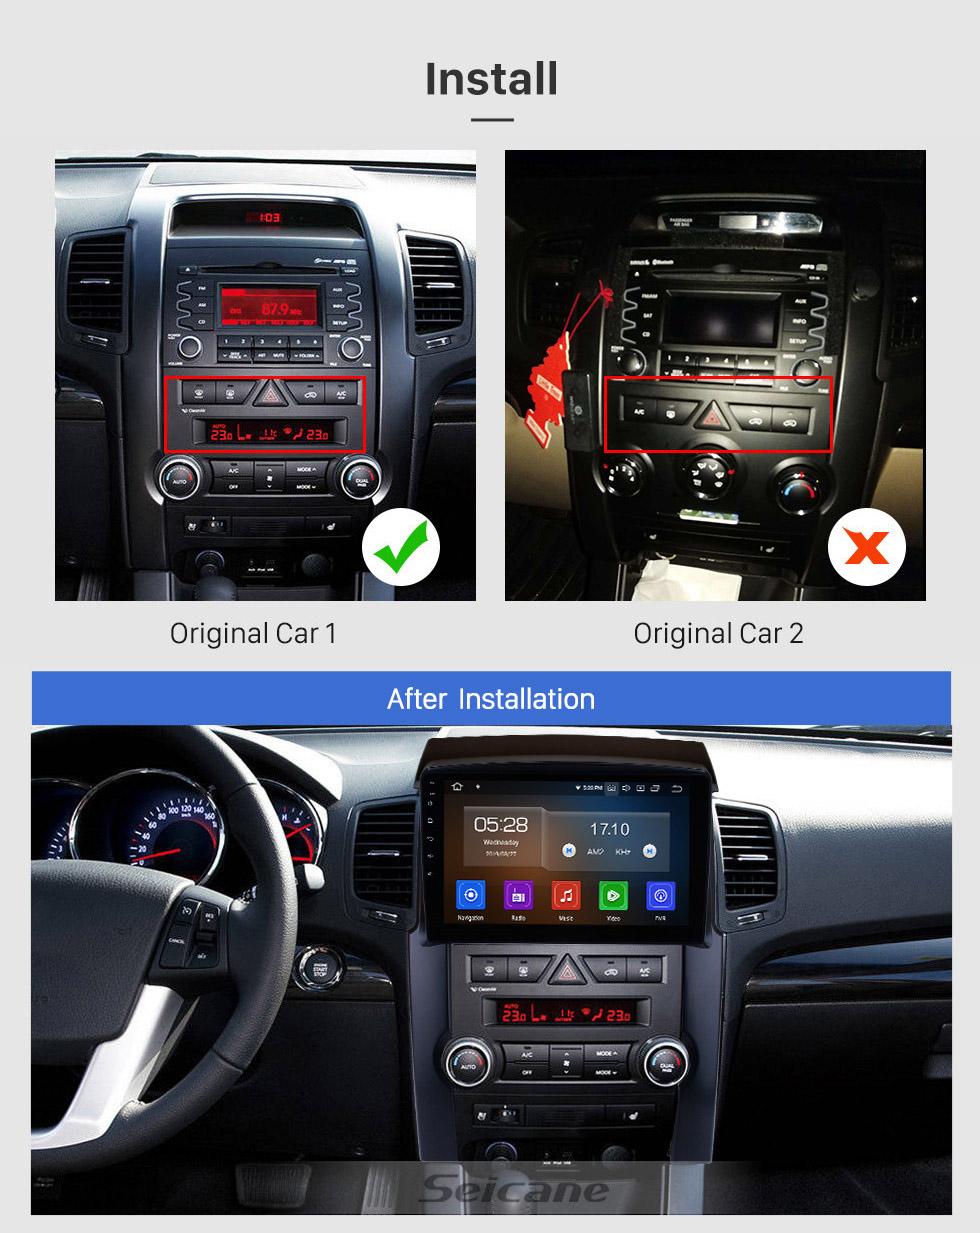 Seicane 10,1 Zoll 2009 2010 2011 2012 KIA Sorento Android 10.0 GPS-Navigationssystem radio Bluetooth 4G Wlan Rückfahrkamera USB DVD-Player TPMS Rückfahrkamera 1080P